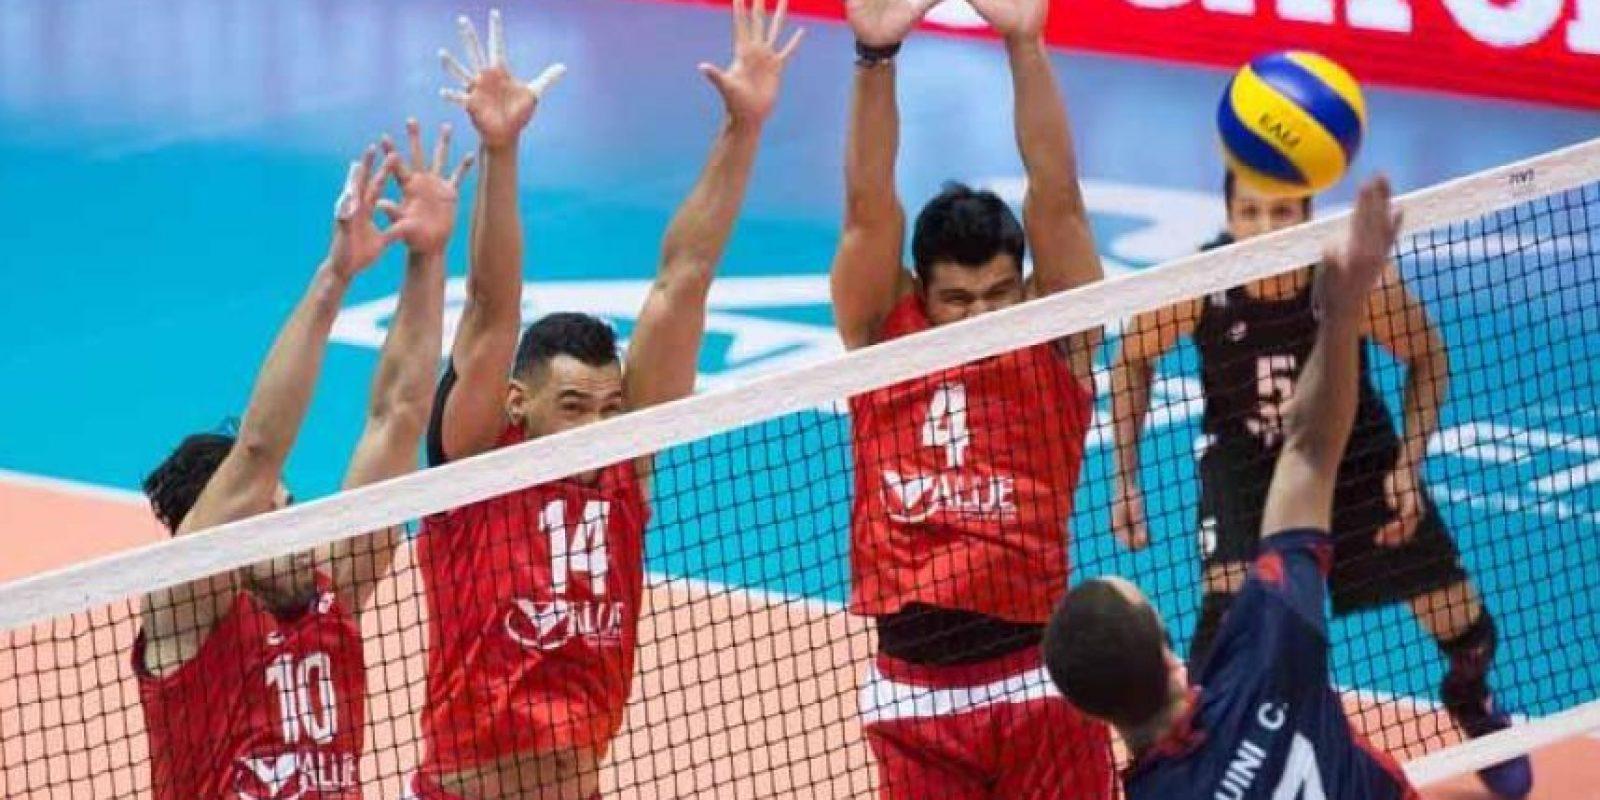 México sumó otra derrota en voleibol masculino, luego de caer 3-0 con Francia Foto:Getty Images